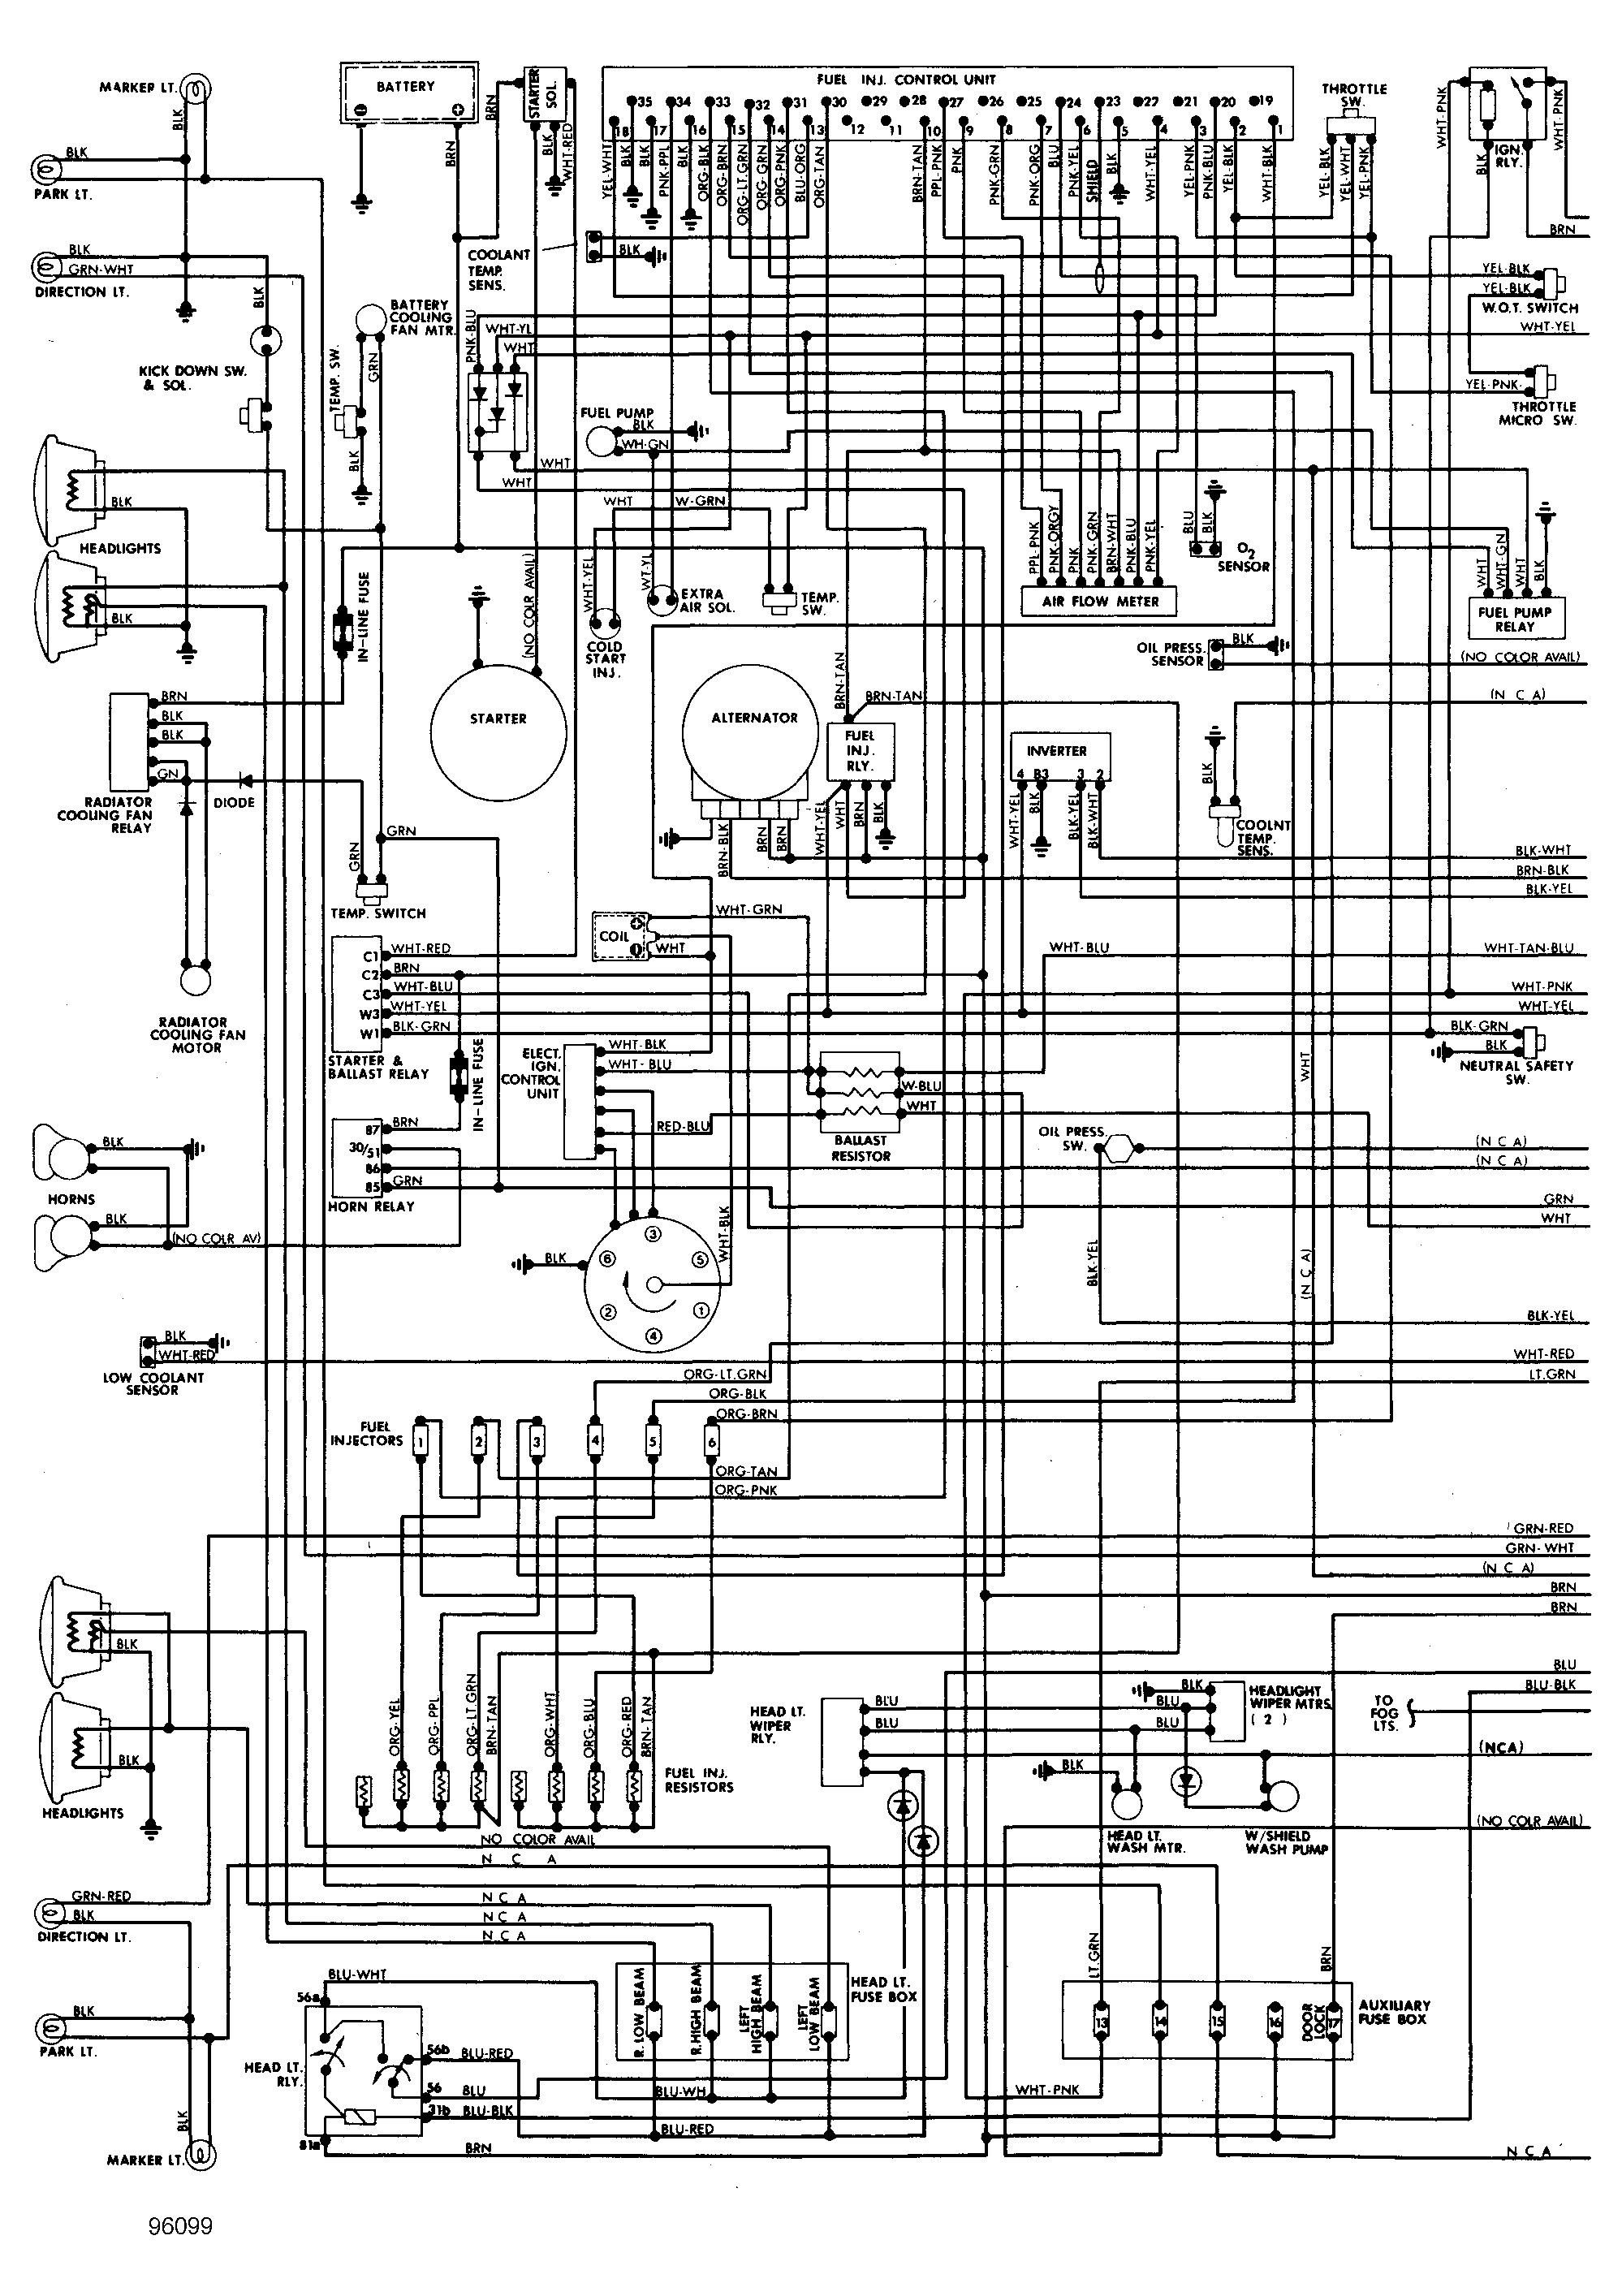 2000 Mercury Grand Marquis Wiring Diagram Jaguar Alternator Wiring Diagram Valid Car 2000 Mercury Grand